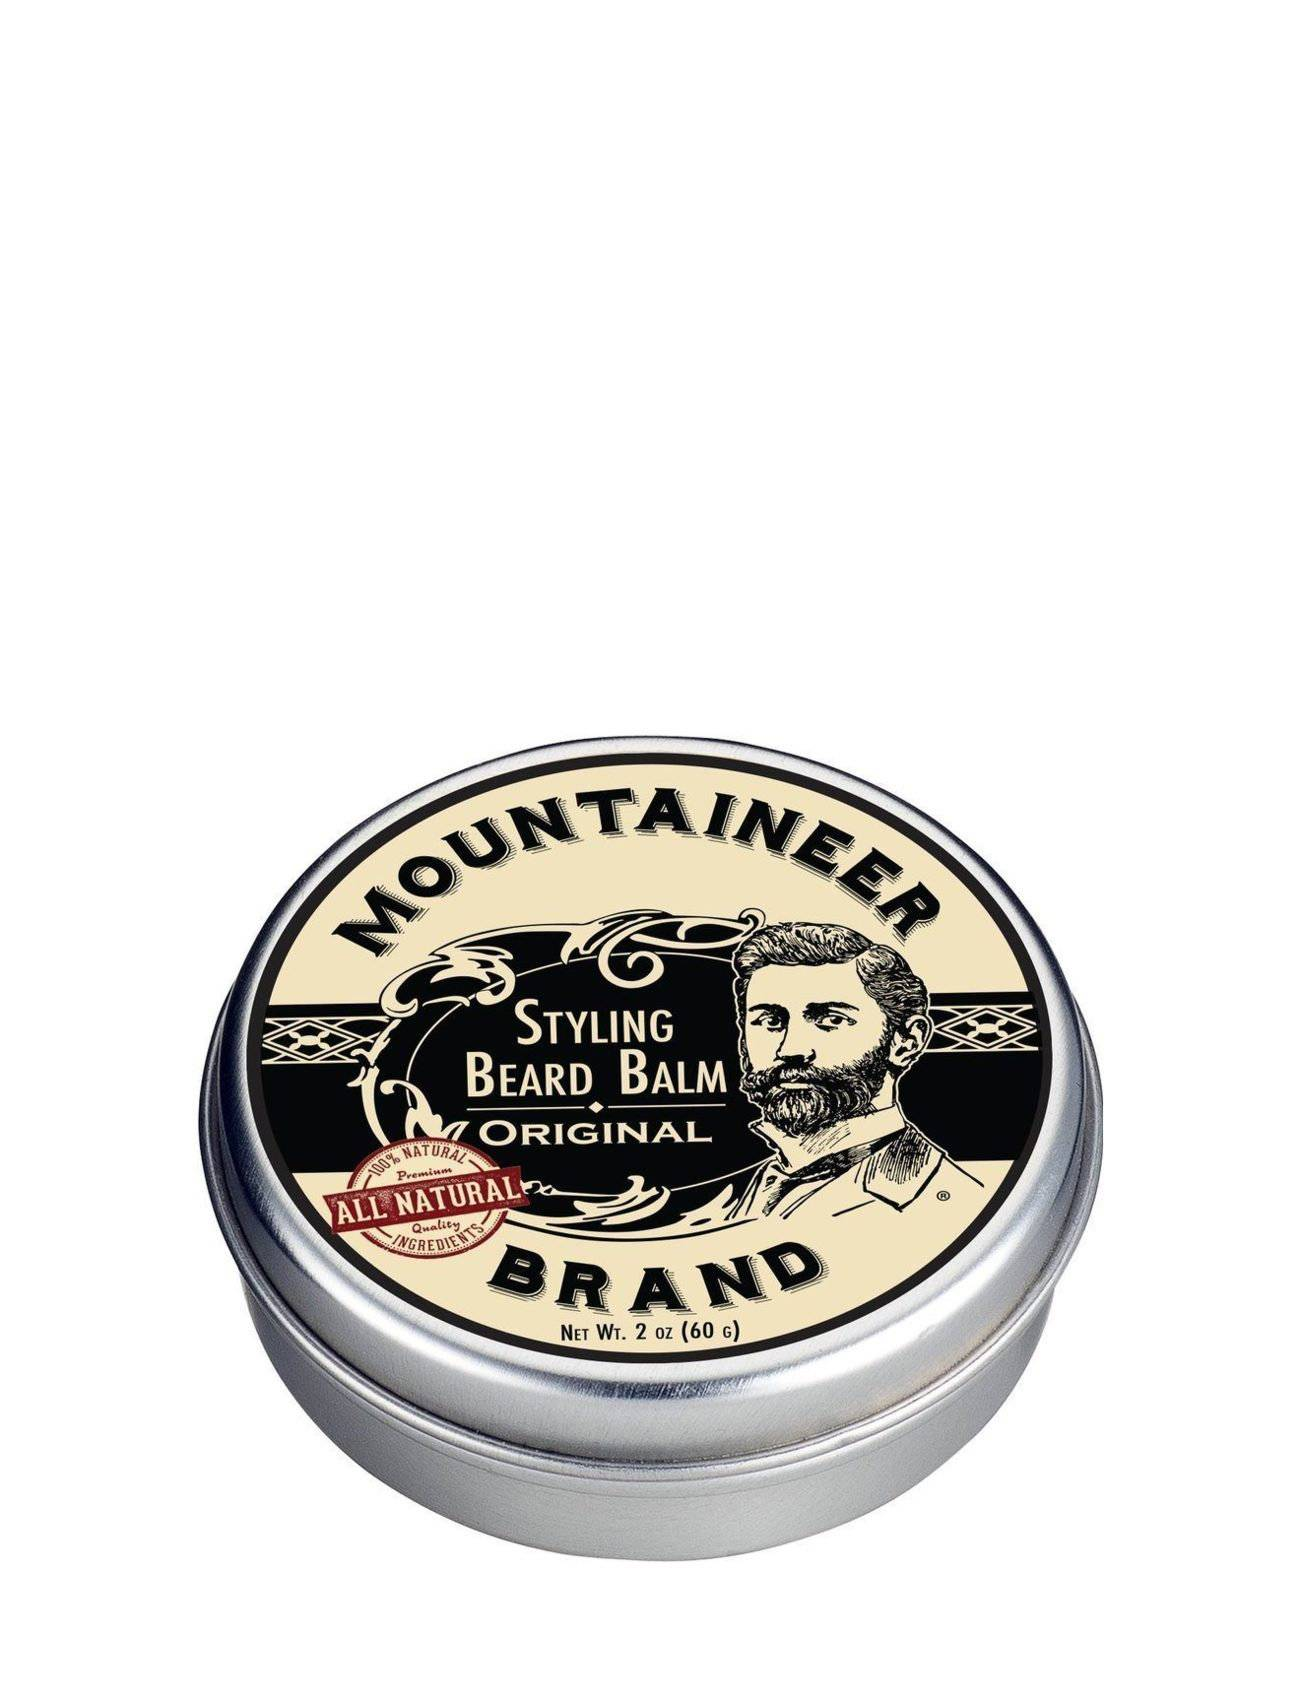 Mountaineer Brand Heavy Duty Timber Beard Balm